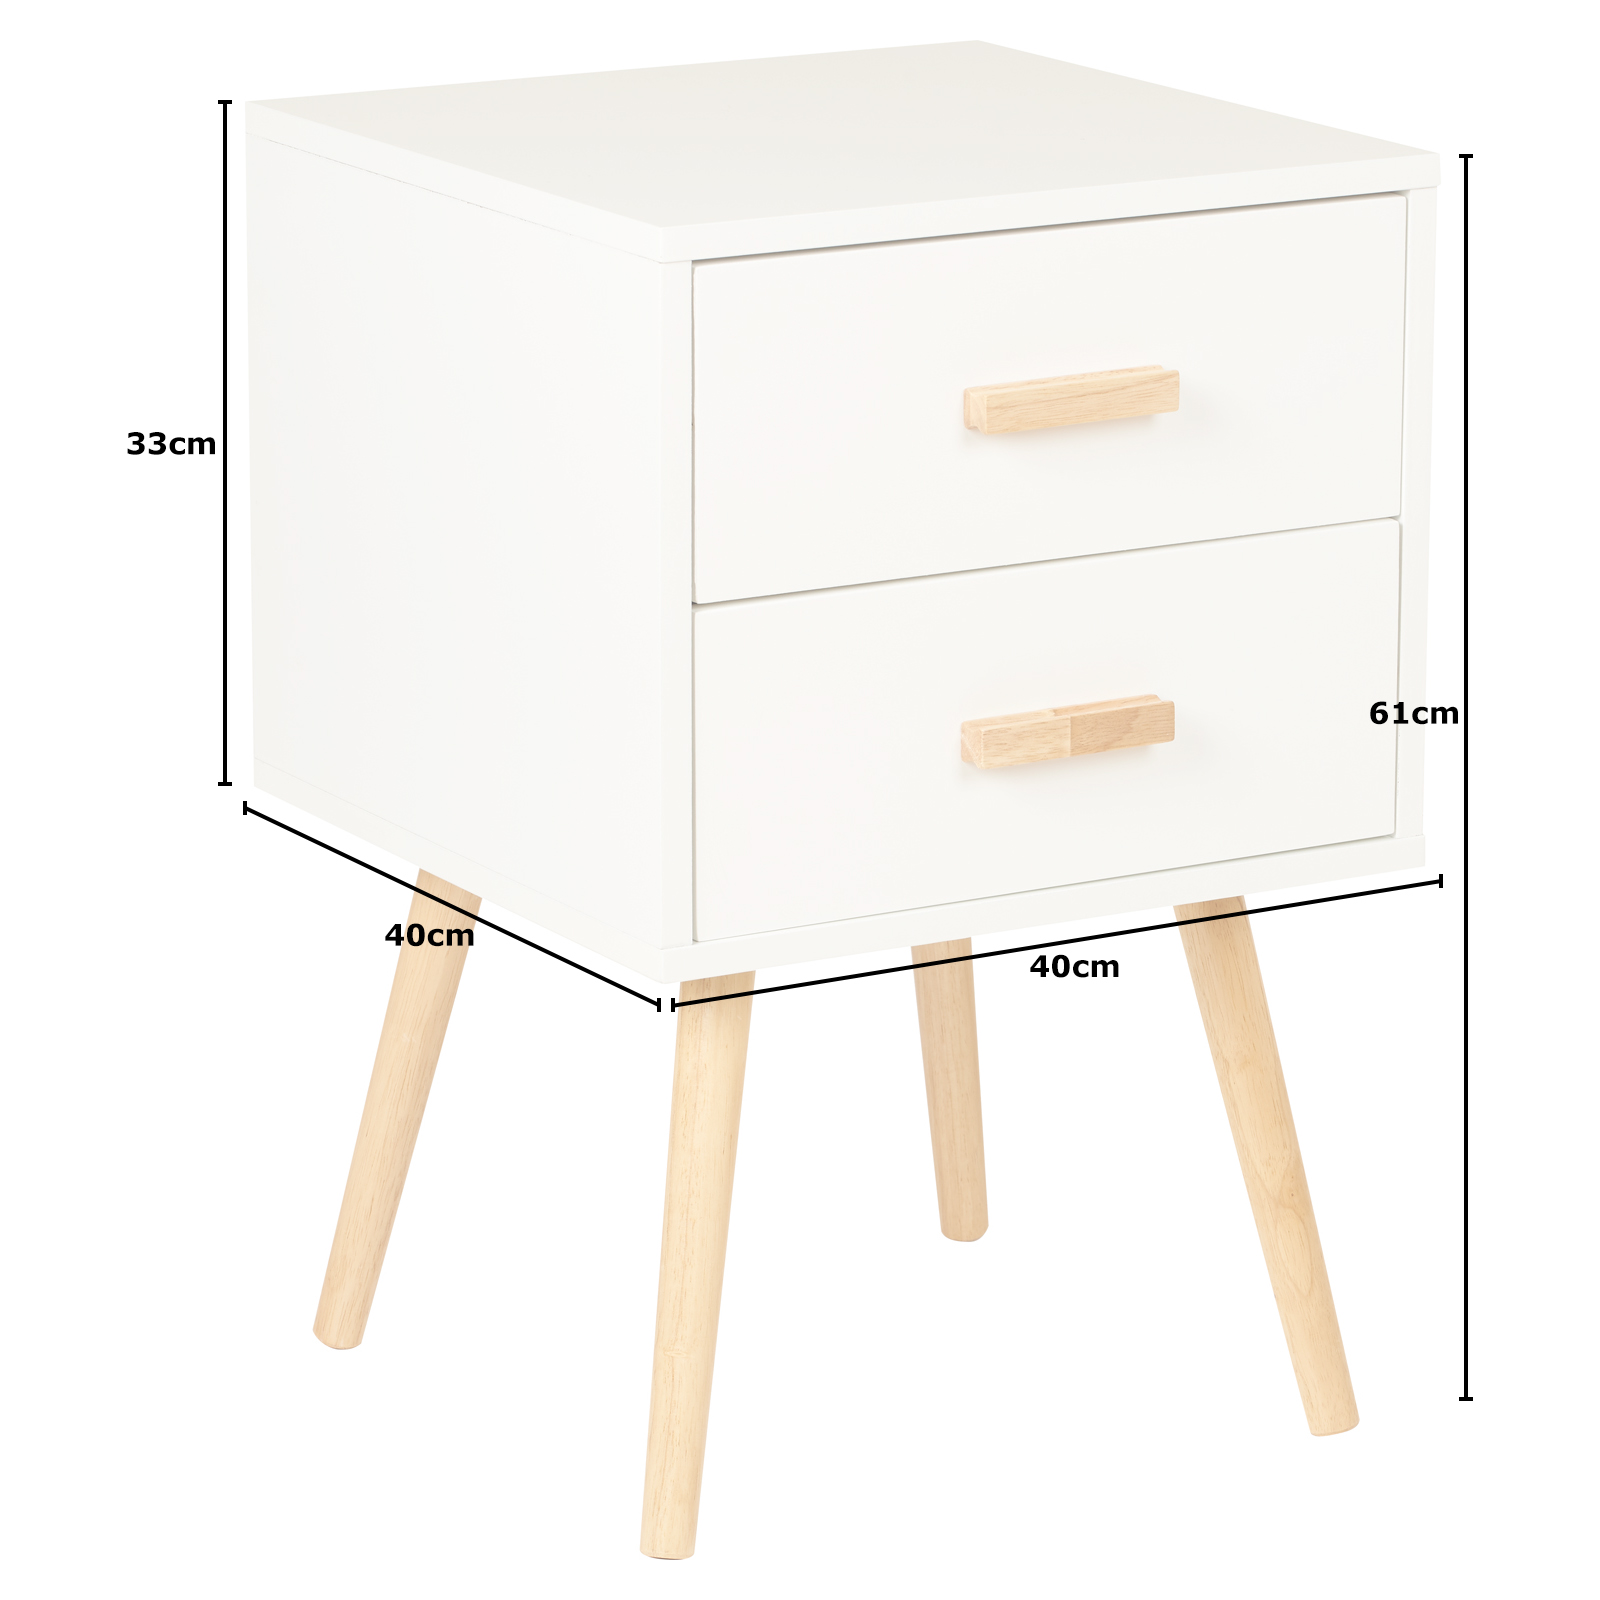 sentinel hartleys table chevet nuit rtro 2 tiroir blanc meuble chambre design scandinave